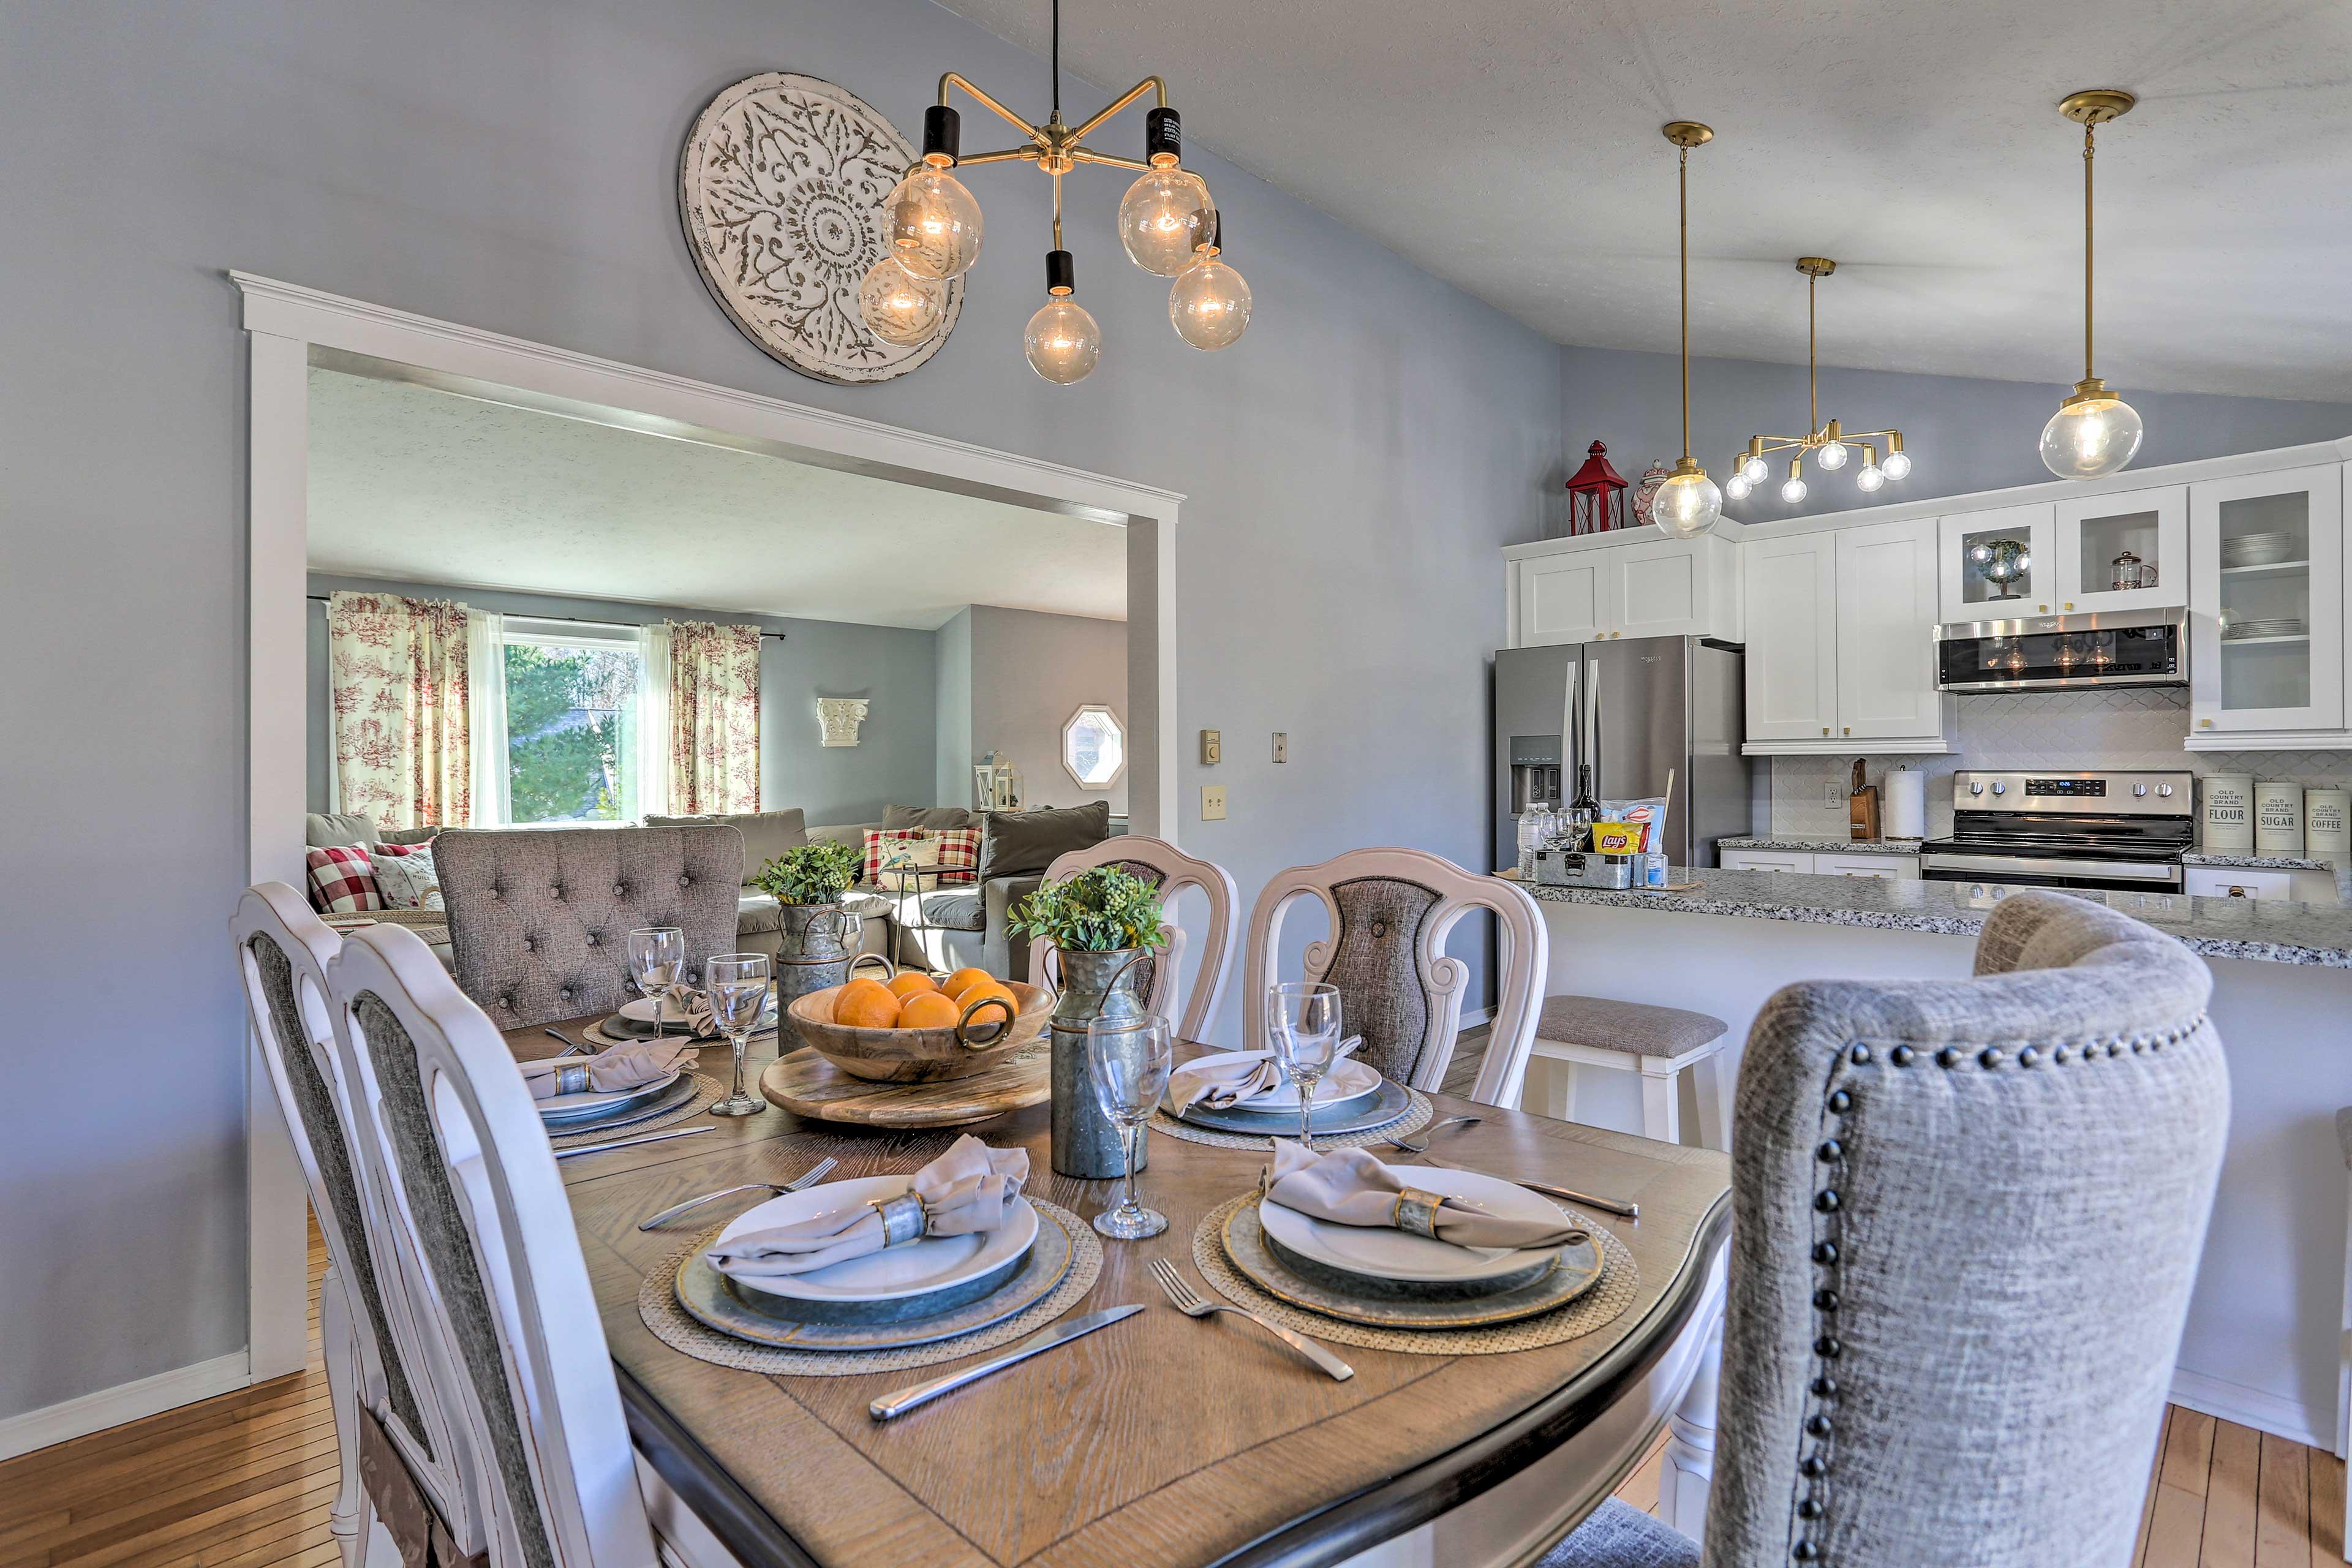 Tobyhanna Vacation Rental | 2 Story Home | 3BR | 3BA | 2,028 Sq Ft